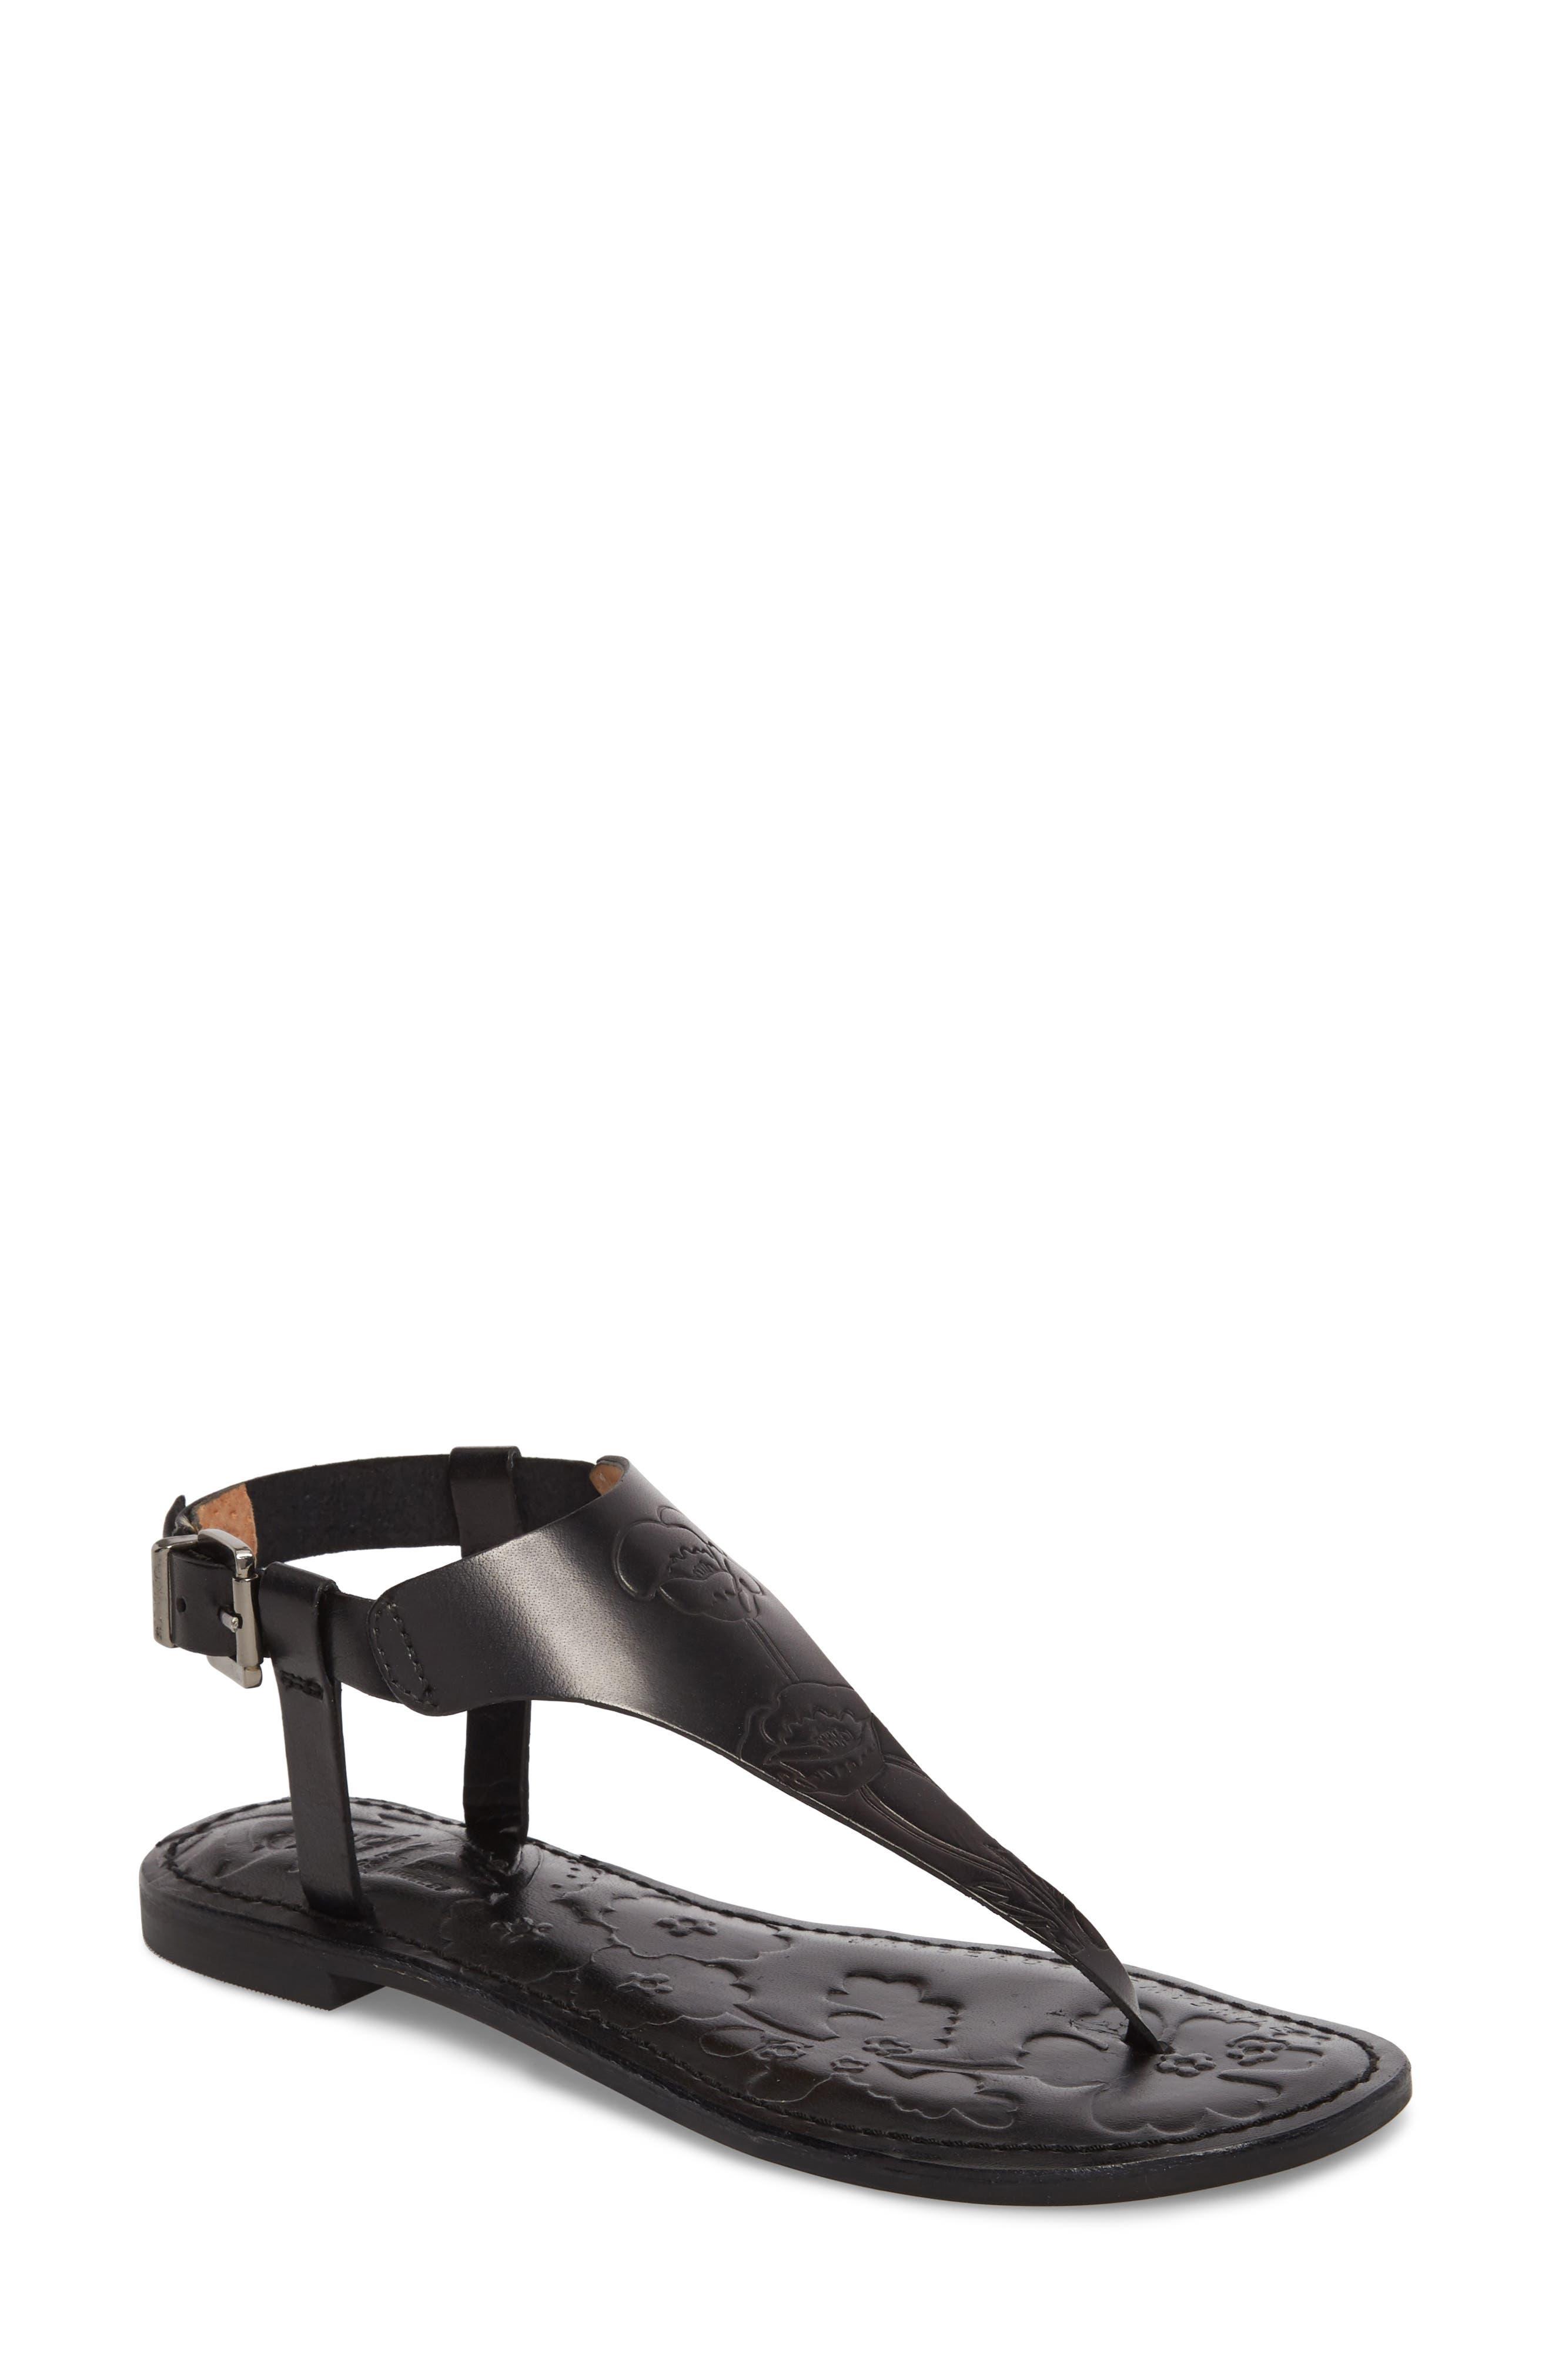 Laxmi Embossed Sandal,                         Main,                         color, BLACK LEATHER